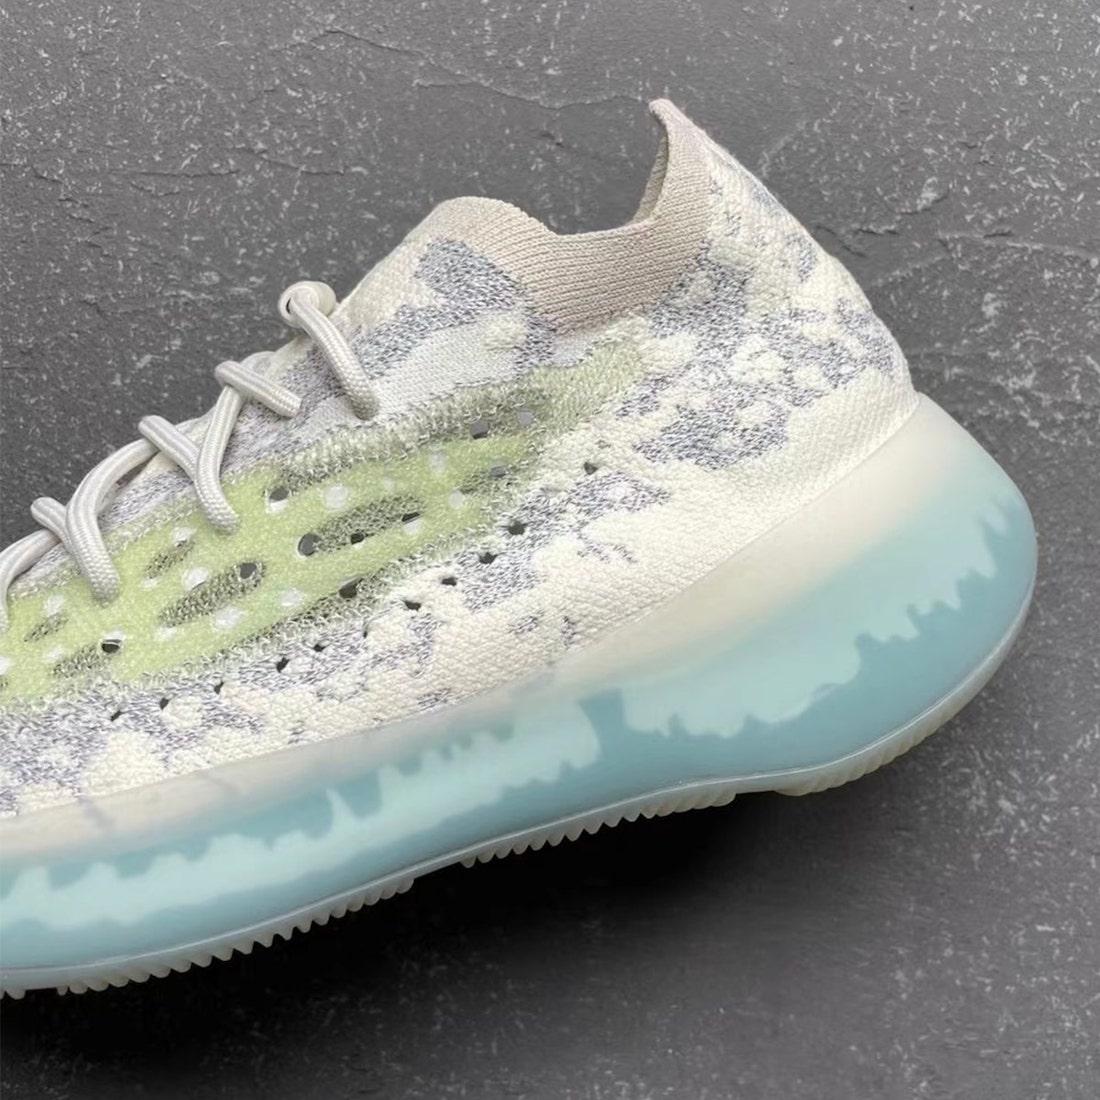 adidas Yeezy Boost 380 Alien Blue GW0304